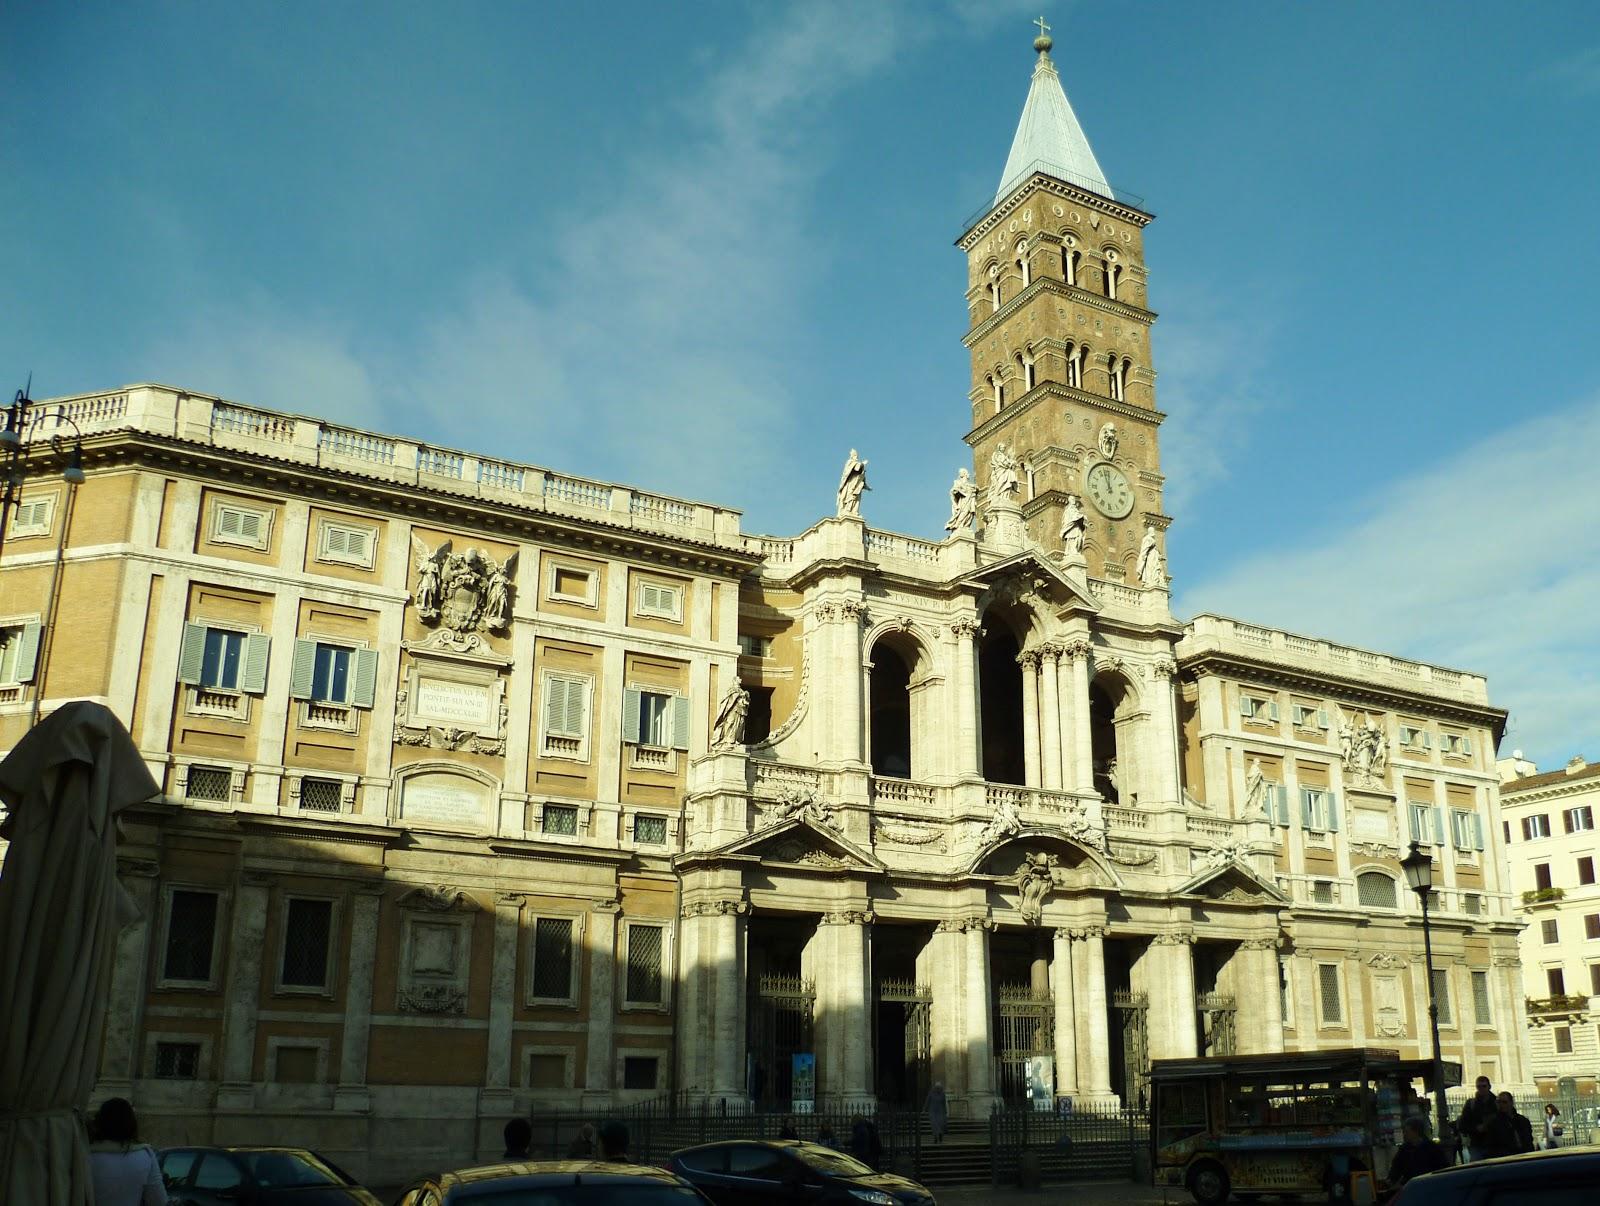 http://3.bp.blogspot.com/_S2s5sJhaqvo/TRoIyVBRbfI/AAAAAAAAALw/-v9SZz2KmZw/s1600/Rome+21+Dec+2010+Santa+Maria+Maggiore.JPG